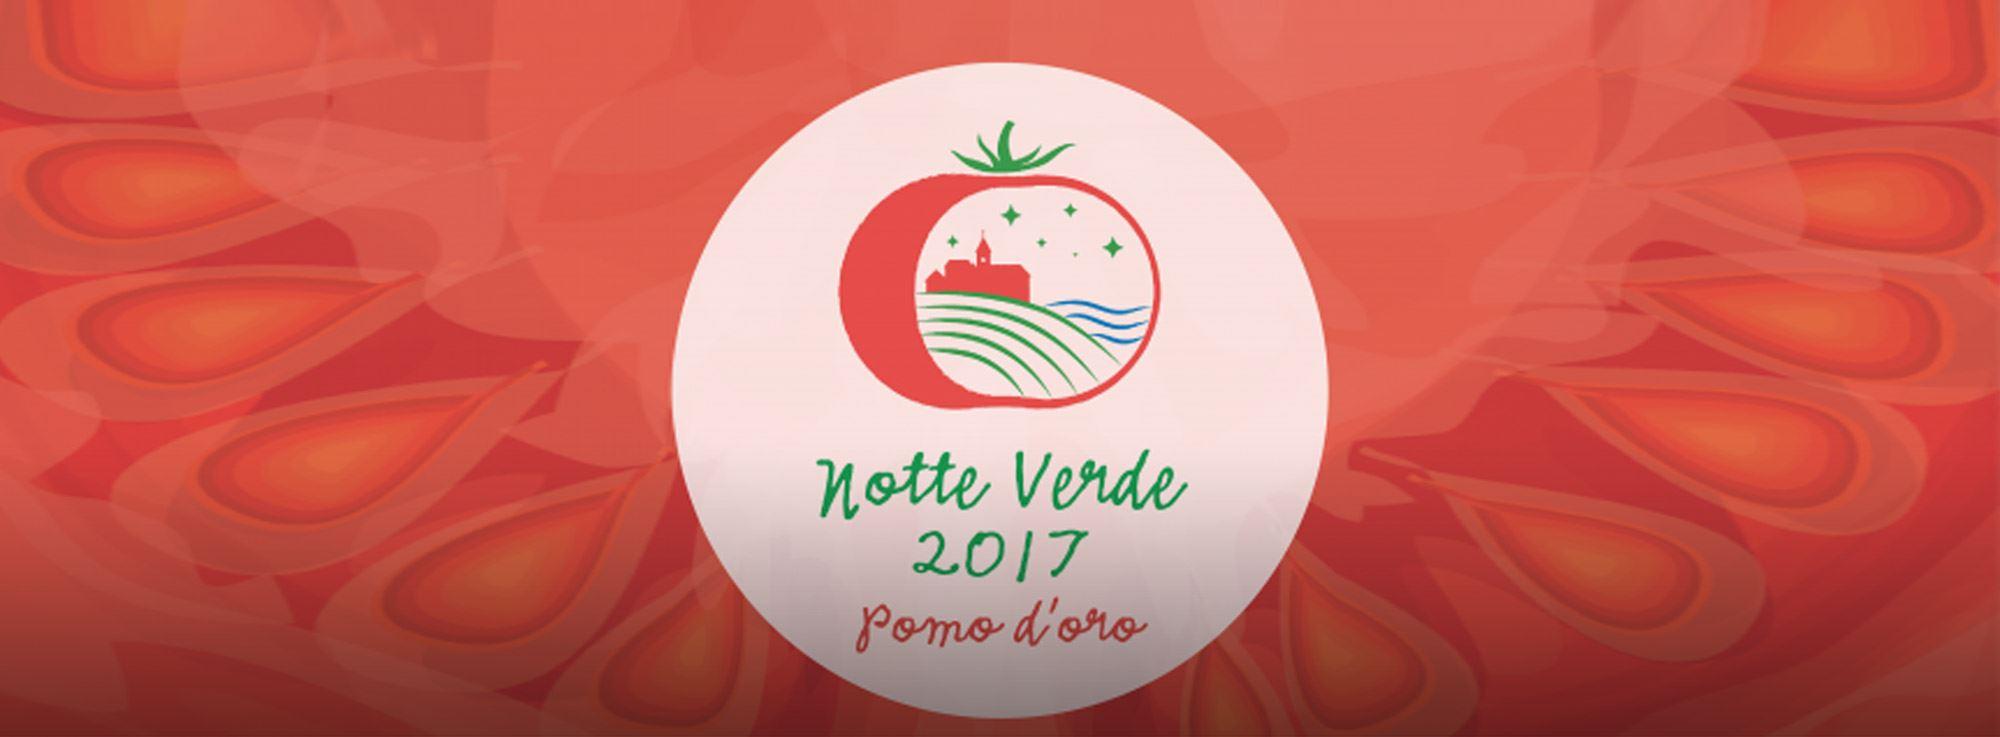 Torre Canne, Cisternino: Notte Verde